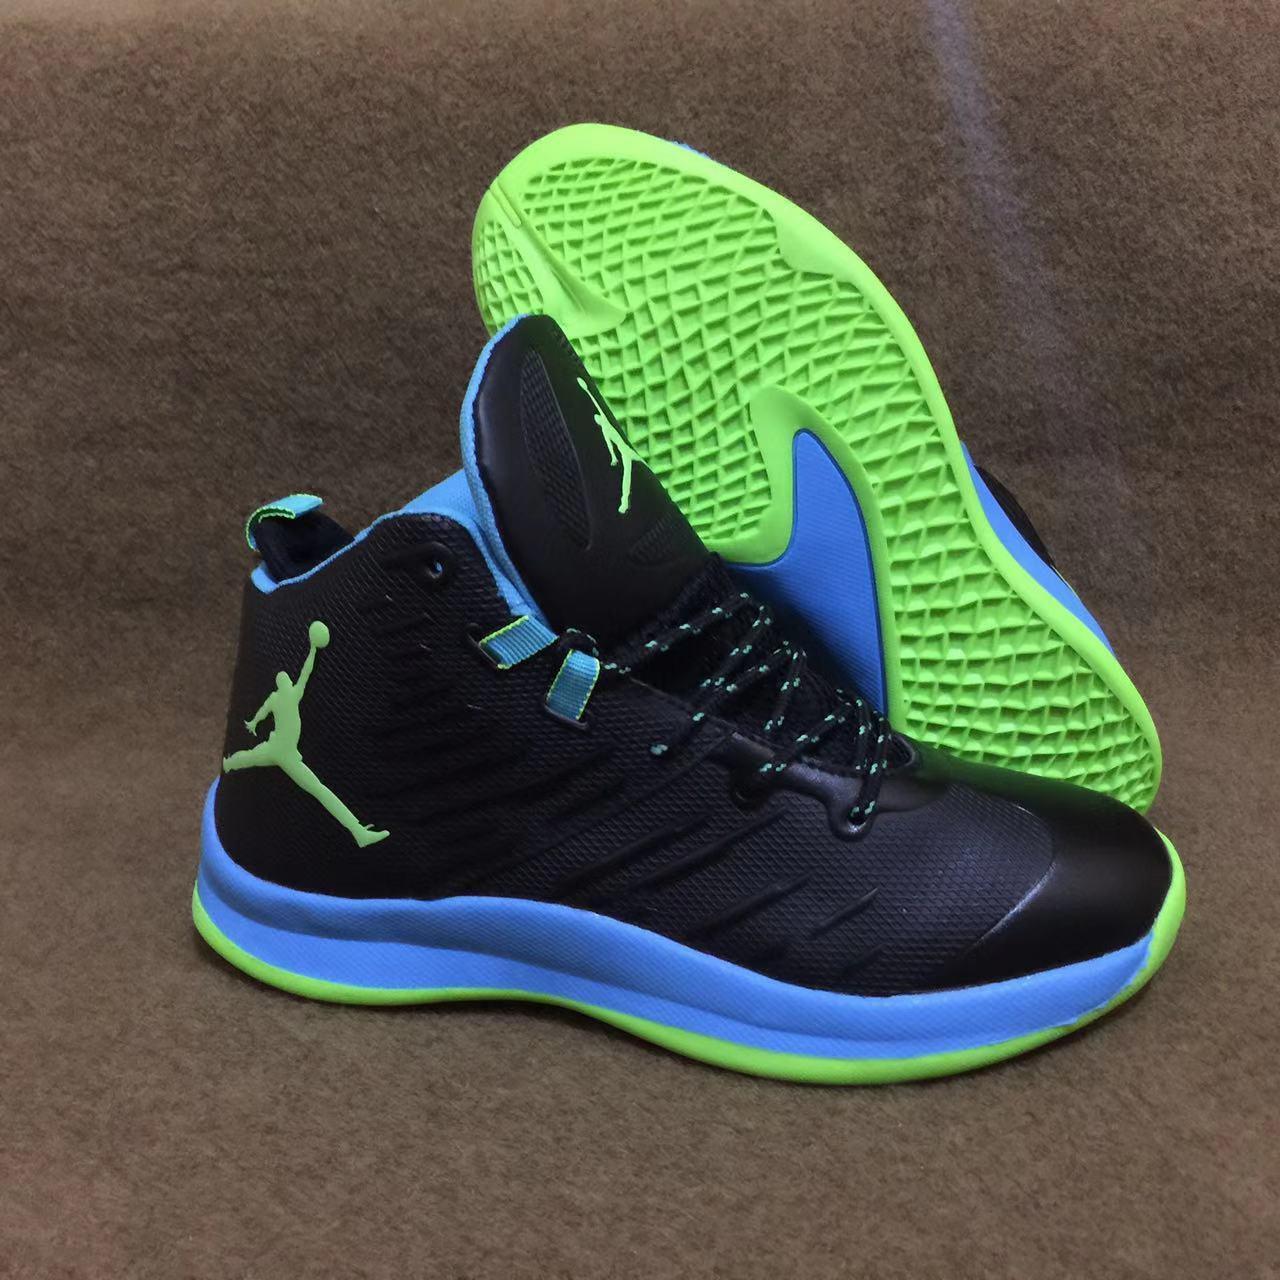 on sale 07cd4 3e96e Authentic Lakers sneakers NIKE_ jordan 5 high cut basketball shoes for men  on sale Original CODsize:41\42\43\44\45